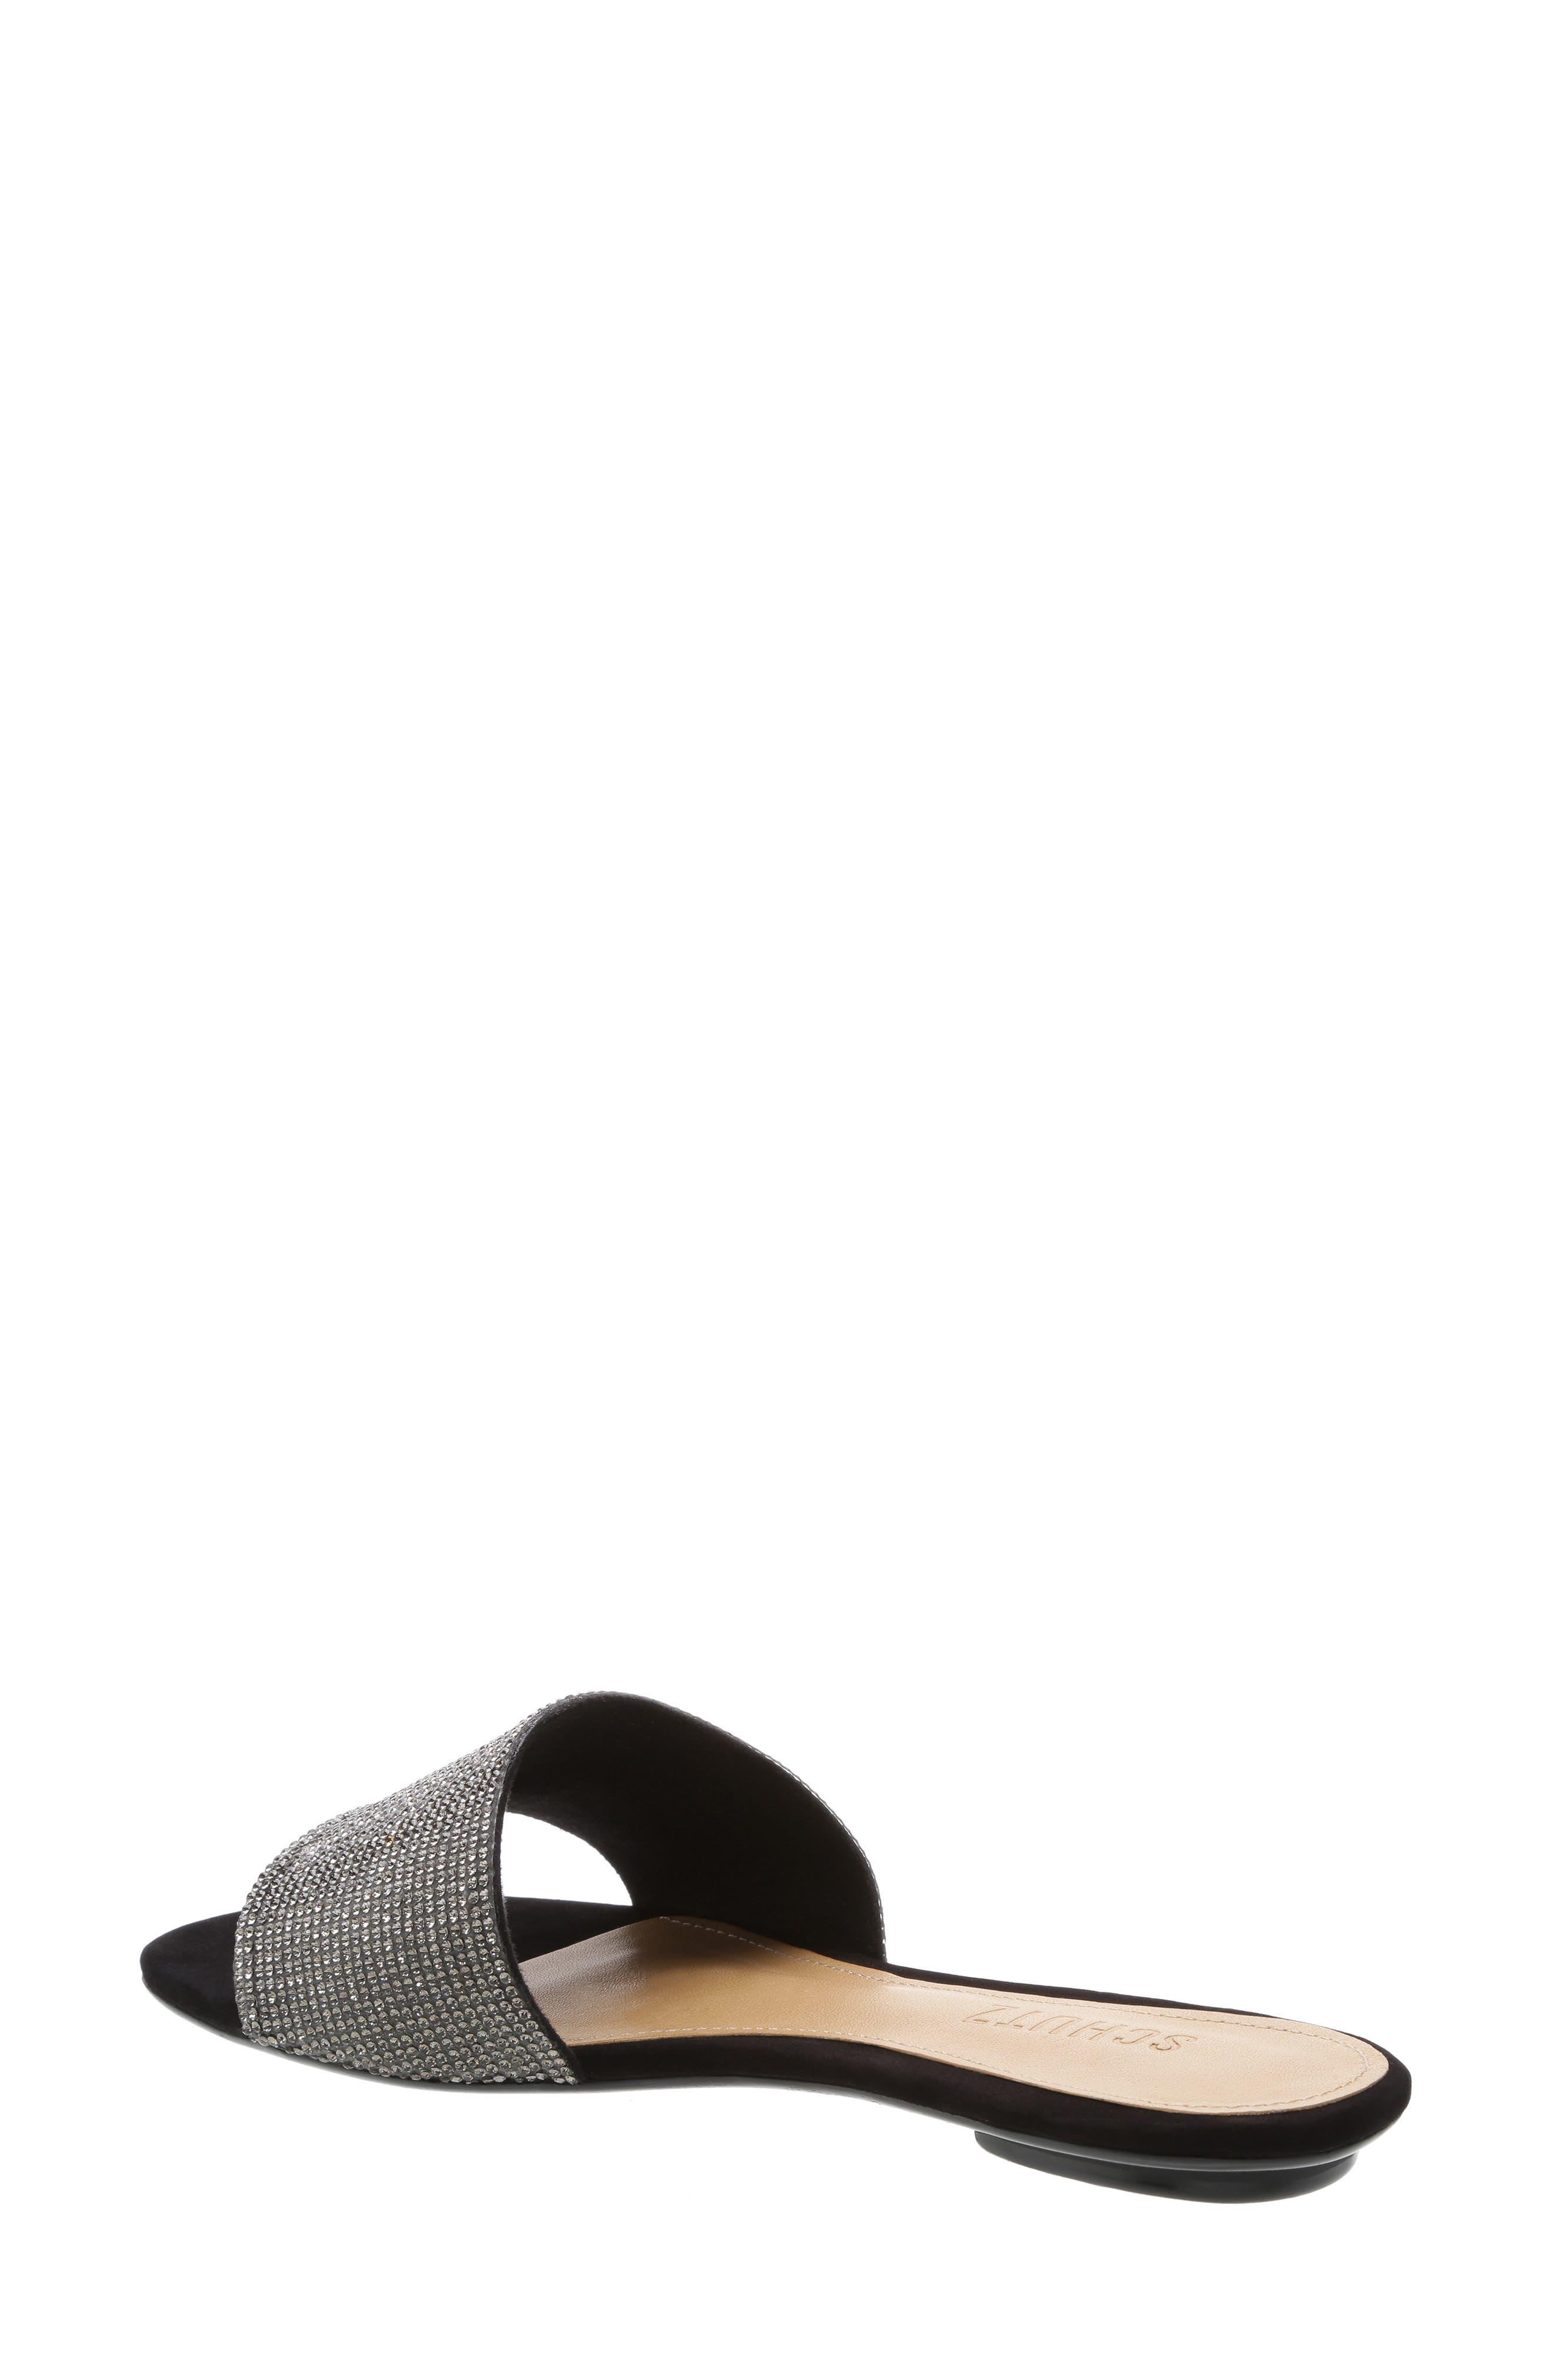 SCHUTZ, Queren Embellished Slide Sandal, Alternate thumbnail 2, color, BLACK/ BLACK DIAMOND FABRIC